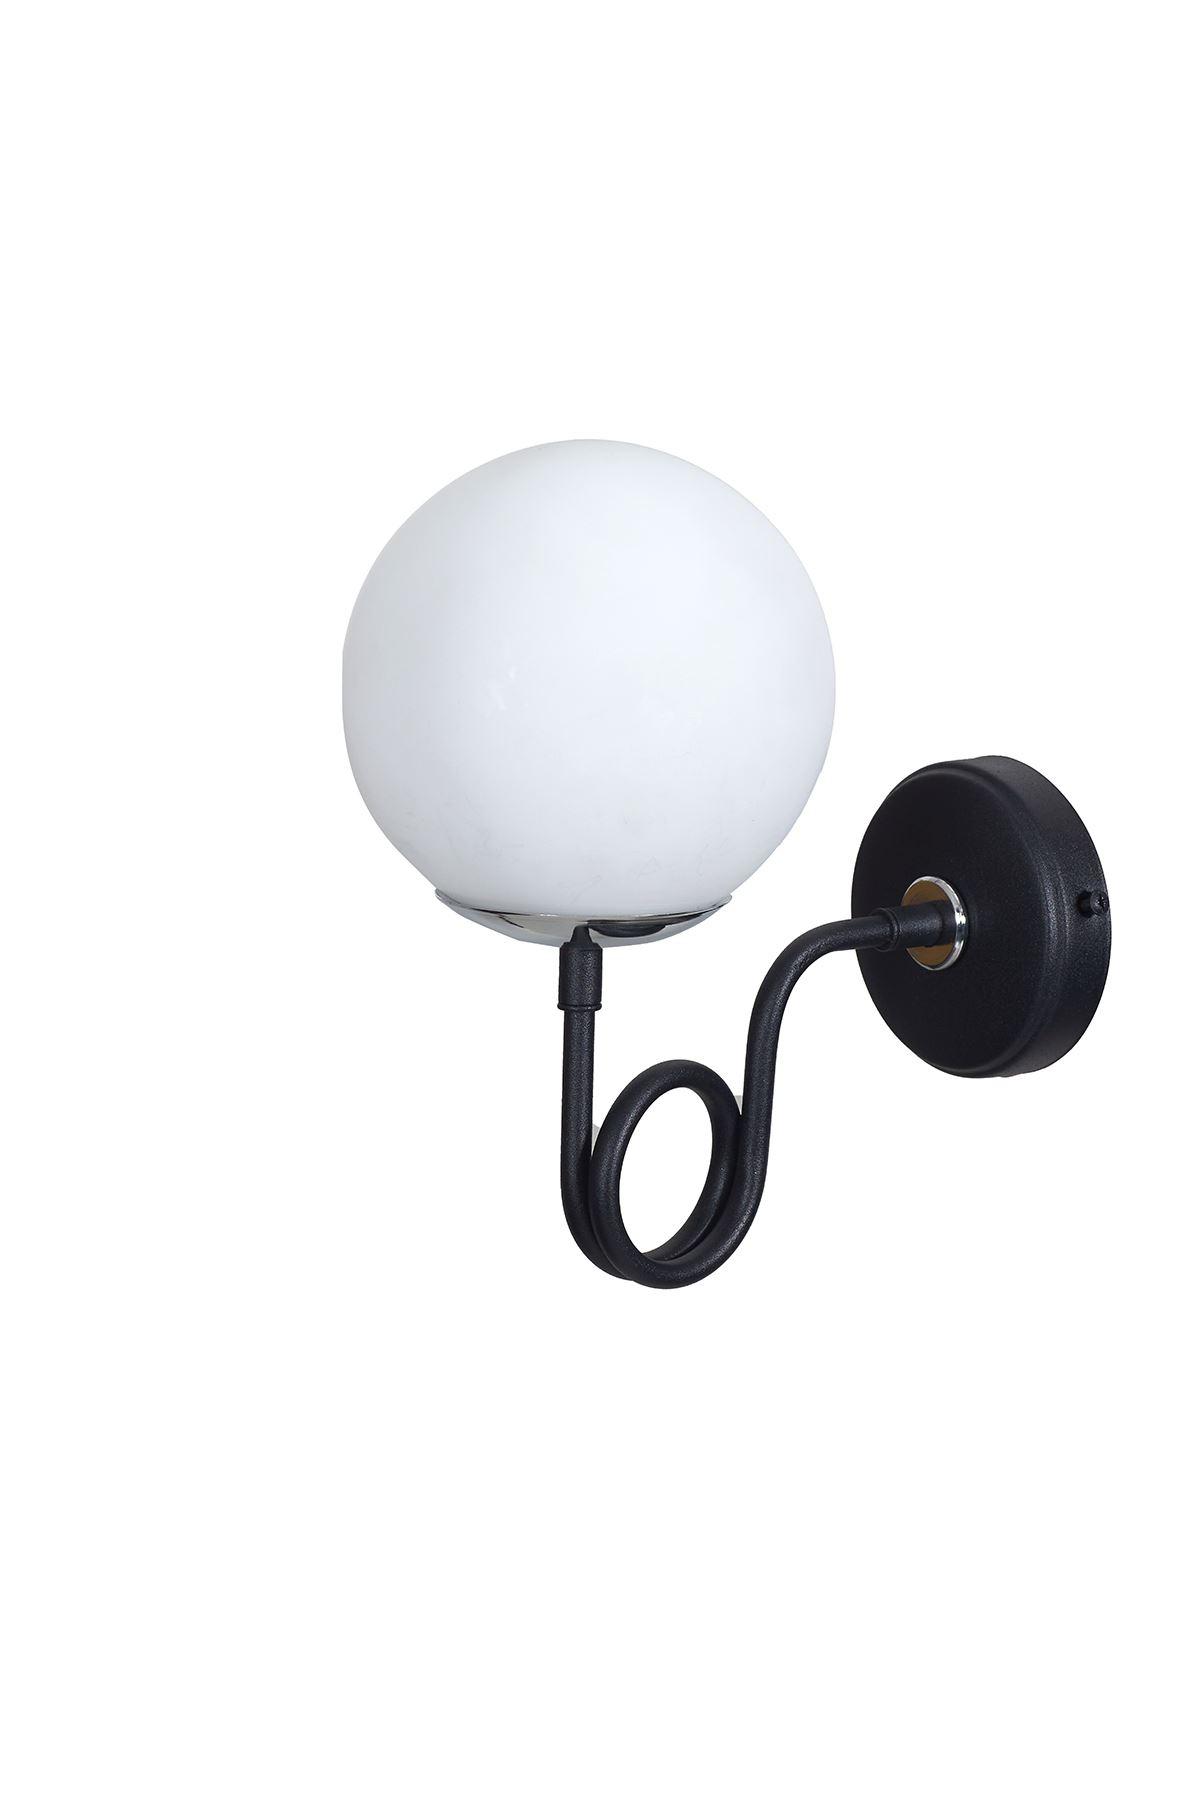 Gali Krom-Siyah Metal Gövde Beyaz Camlı Tasarım Lüx Aplik